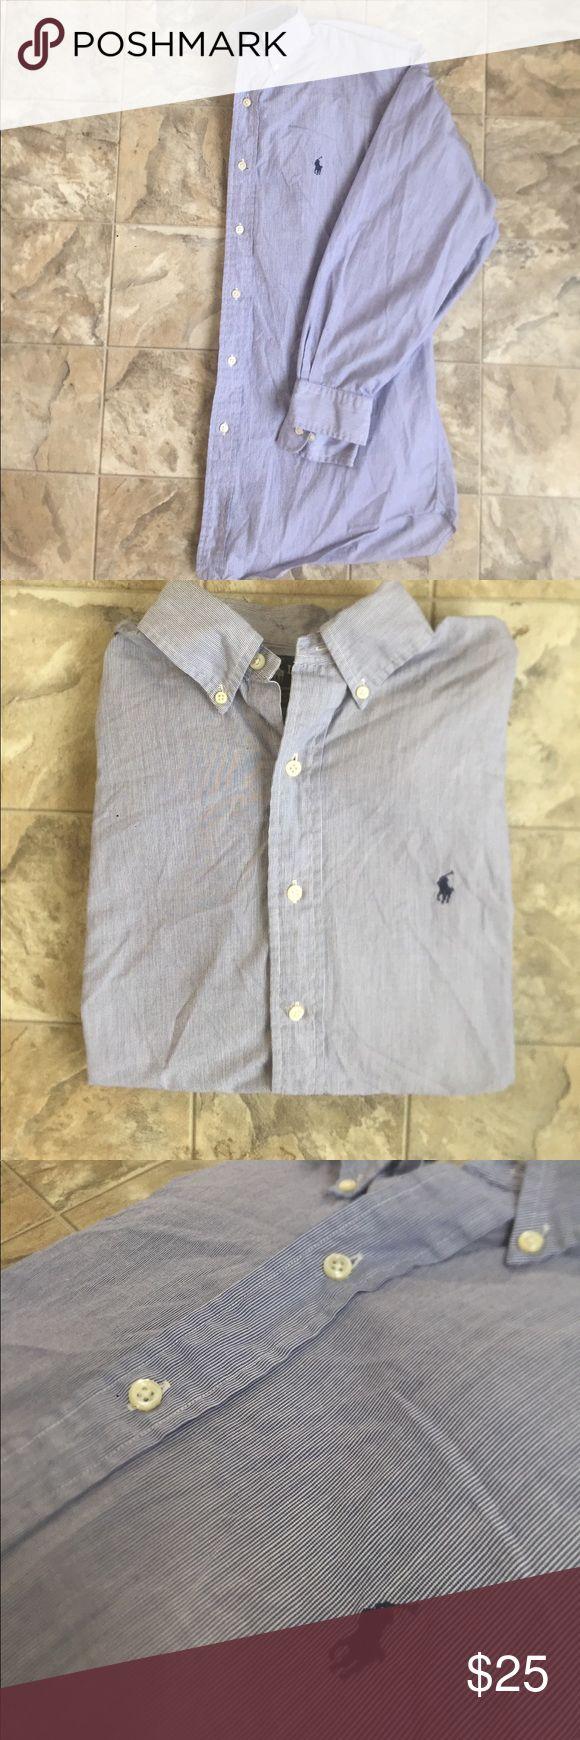 Ralph Lauren casual button down shirt Great condition Ralph Lauren button down shirt. Perfect for fall Rush! Ralph Lauren Shirts Casual Button Down Shirts